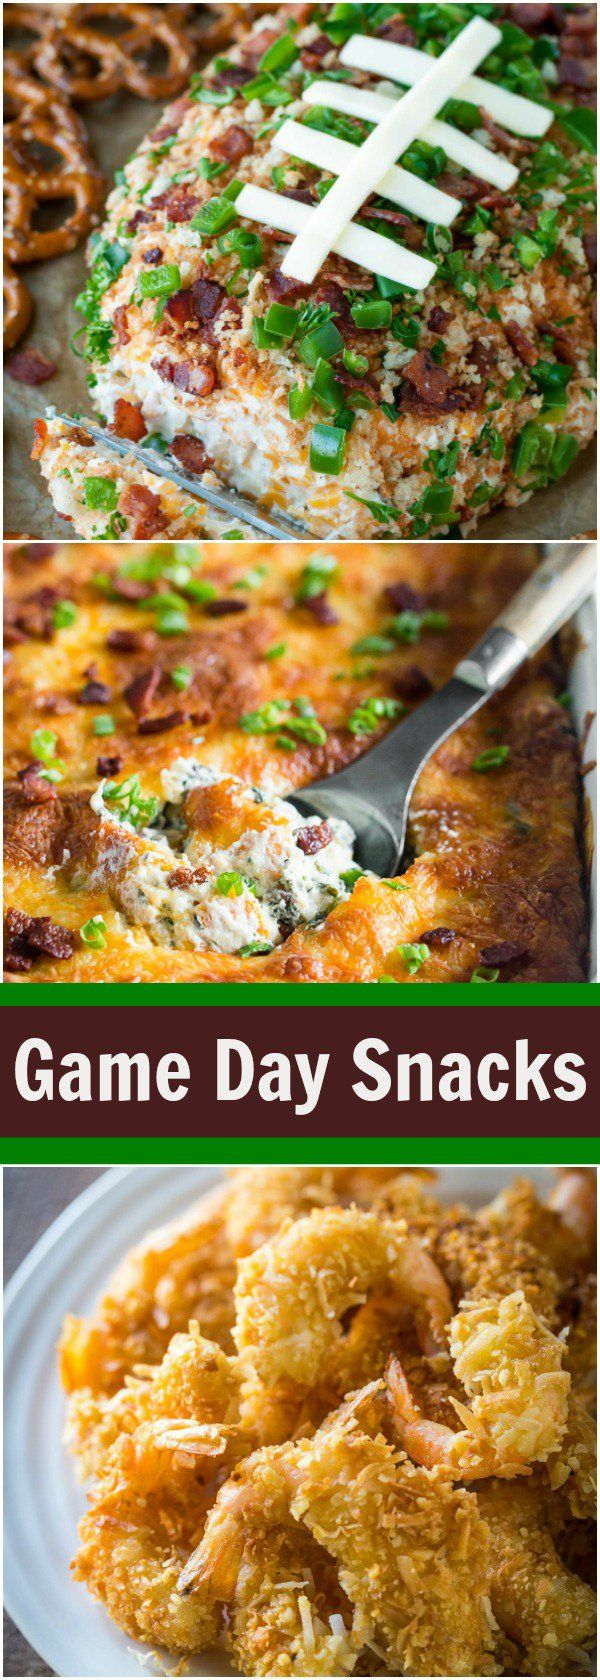 18 Winning Game Day Snacks